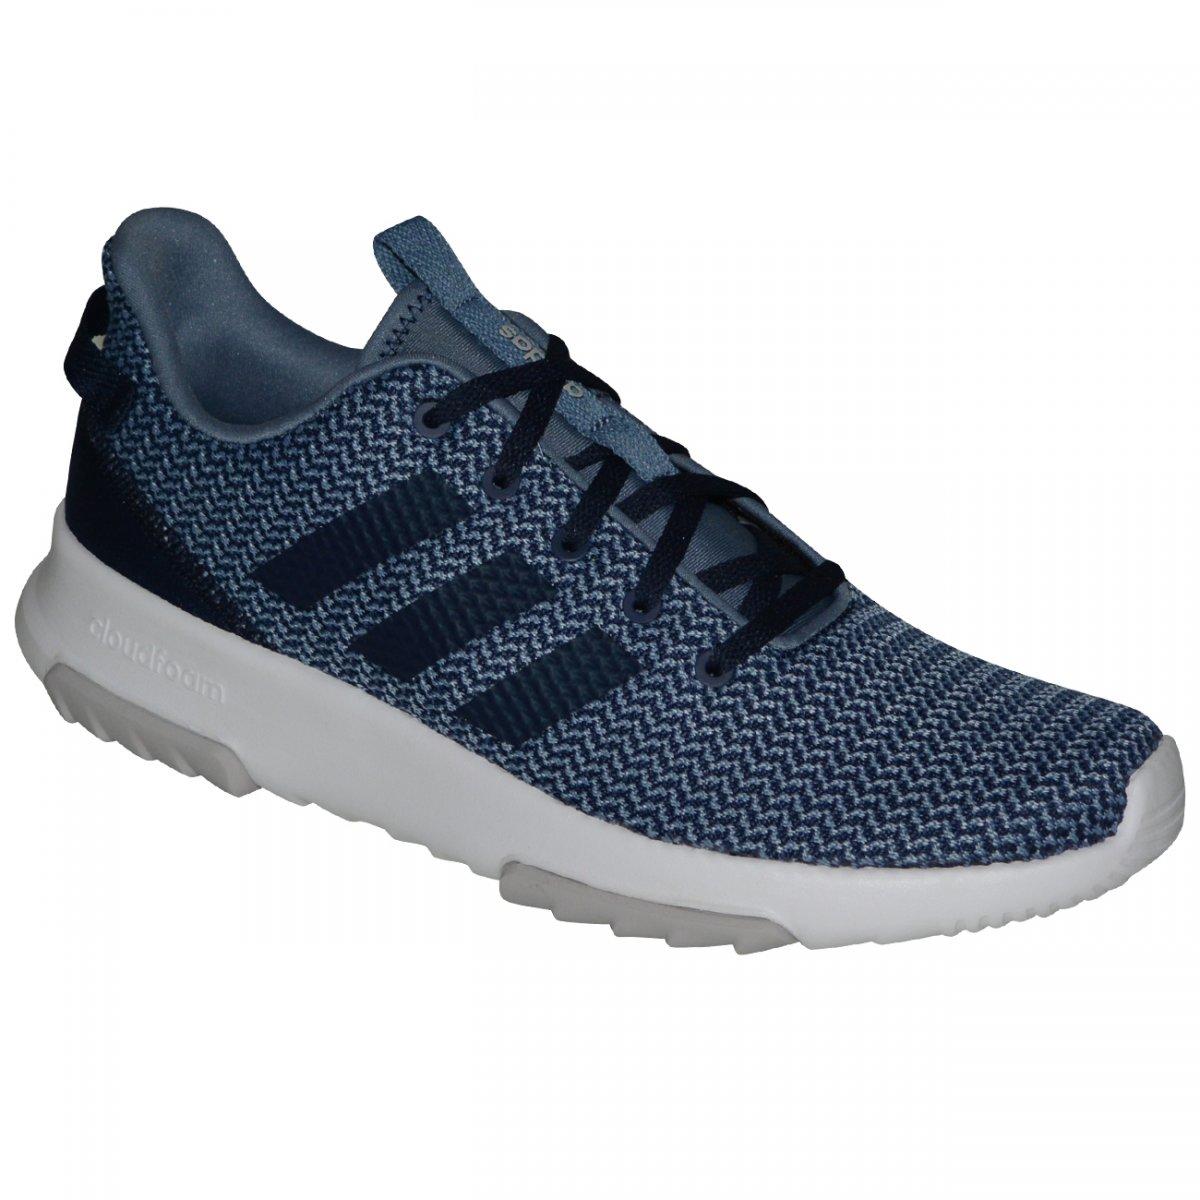 80146ad0a2d Tenis Adidas CF Racer TR DB0693 - Azul marinho - Chuteira Nike ...